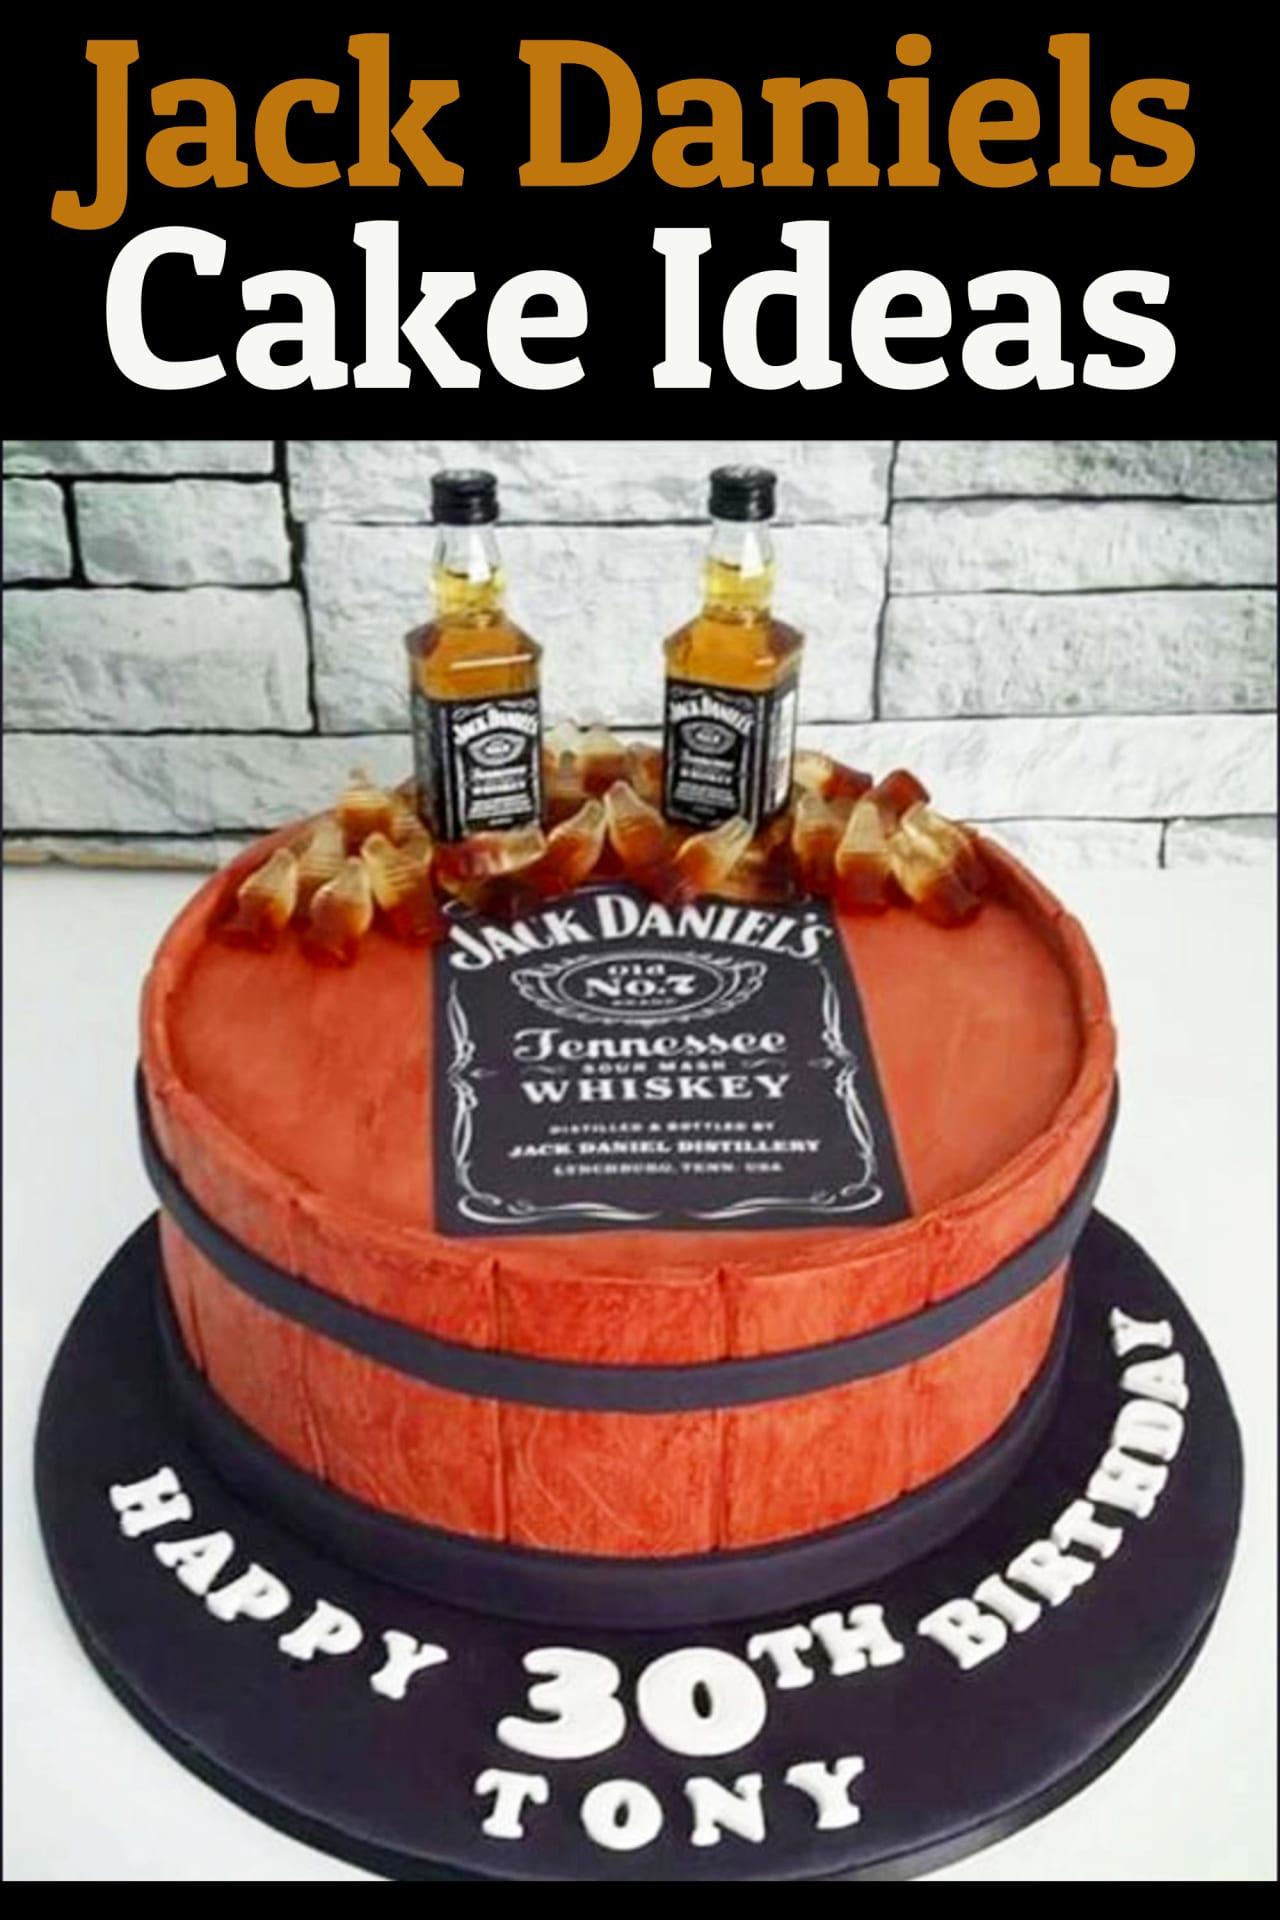 Jack Daniels Cake Ideas - Whiskey Bottle Crafts